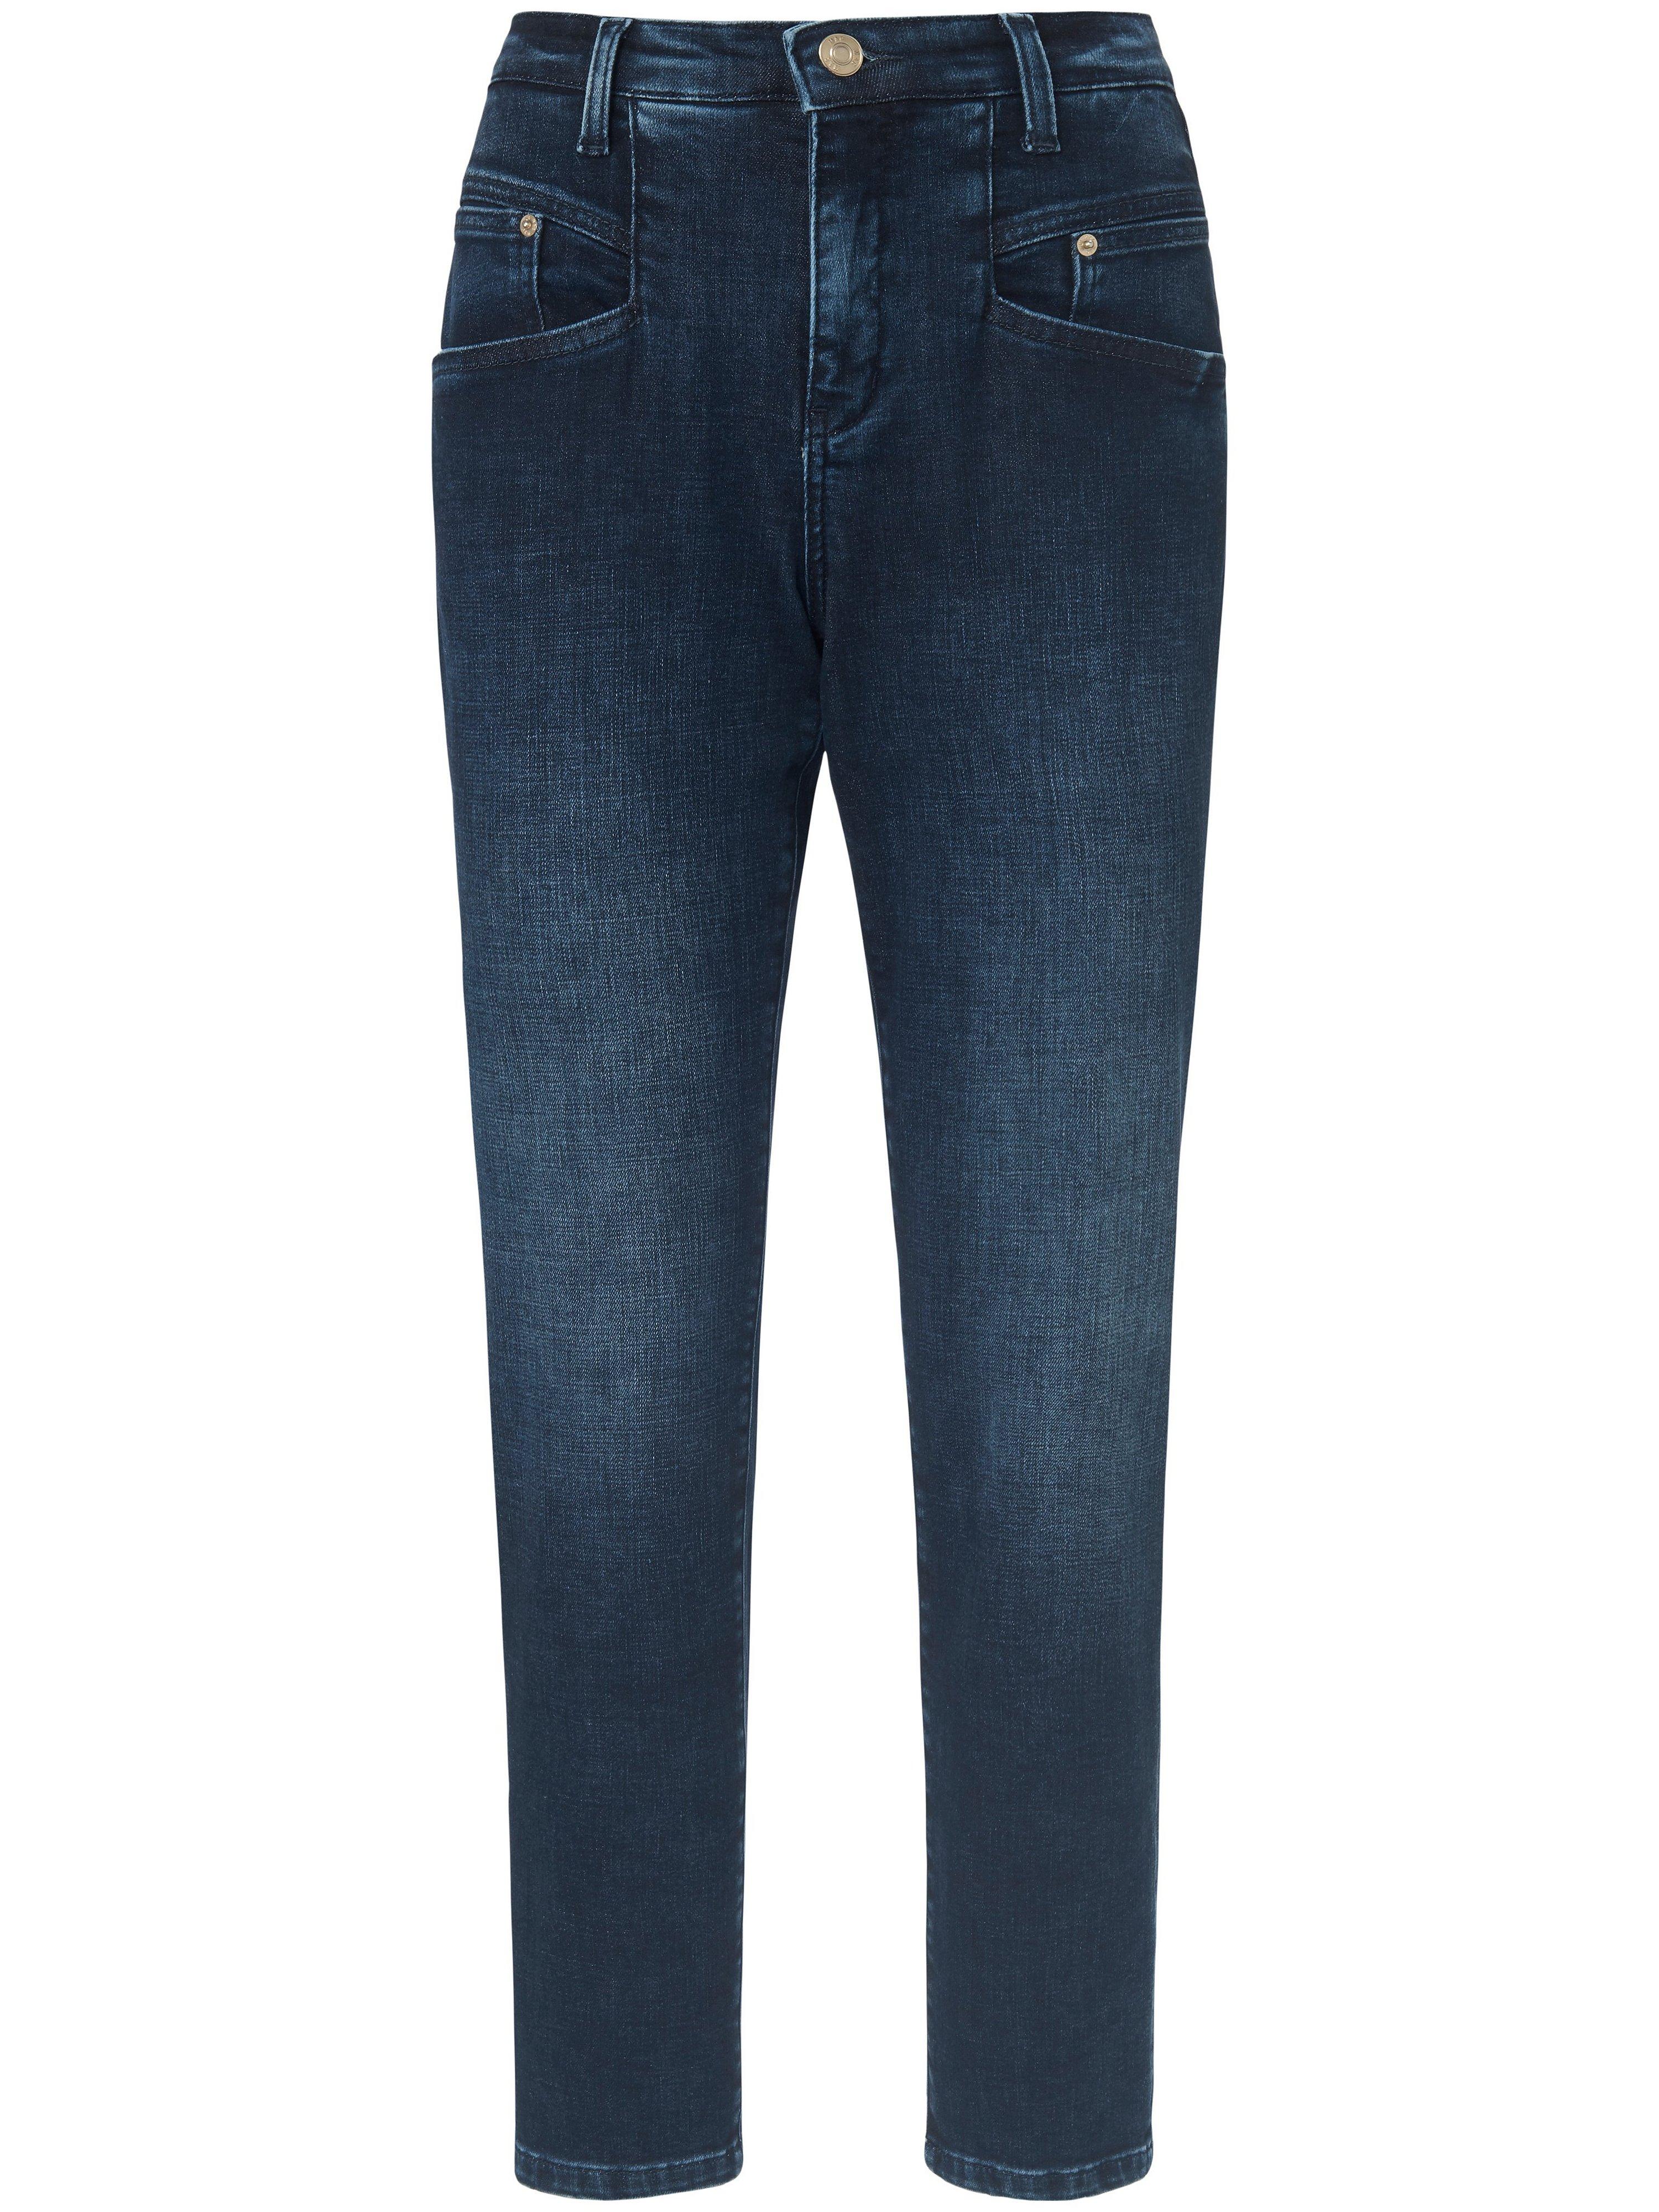 7/8-jeans model Rich Carrot Van Mac denim